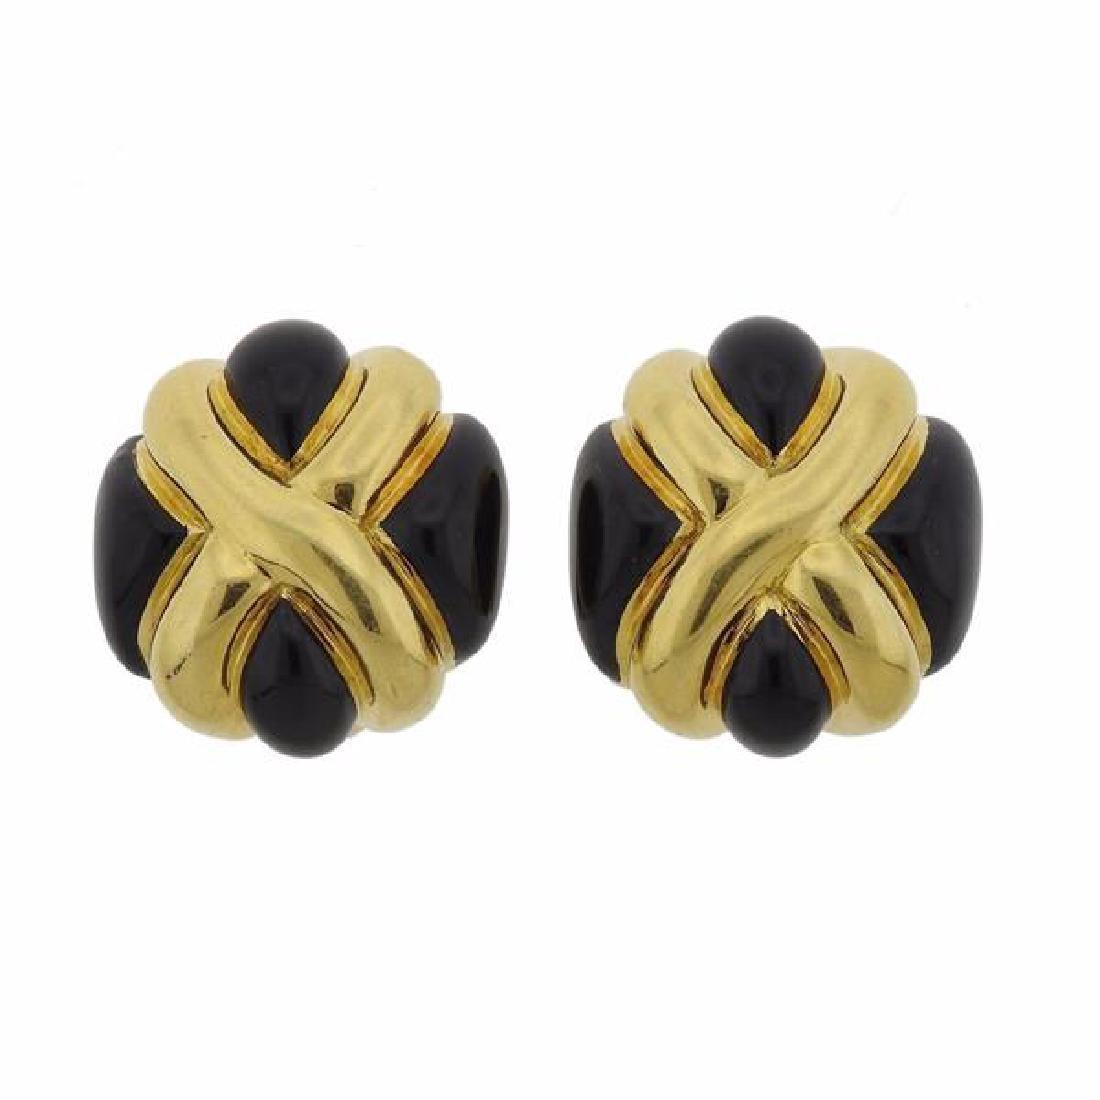 Andrew Clunn 18K Gold Onyx Earrings